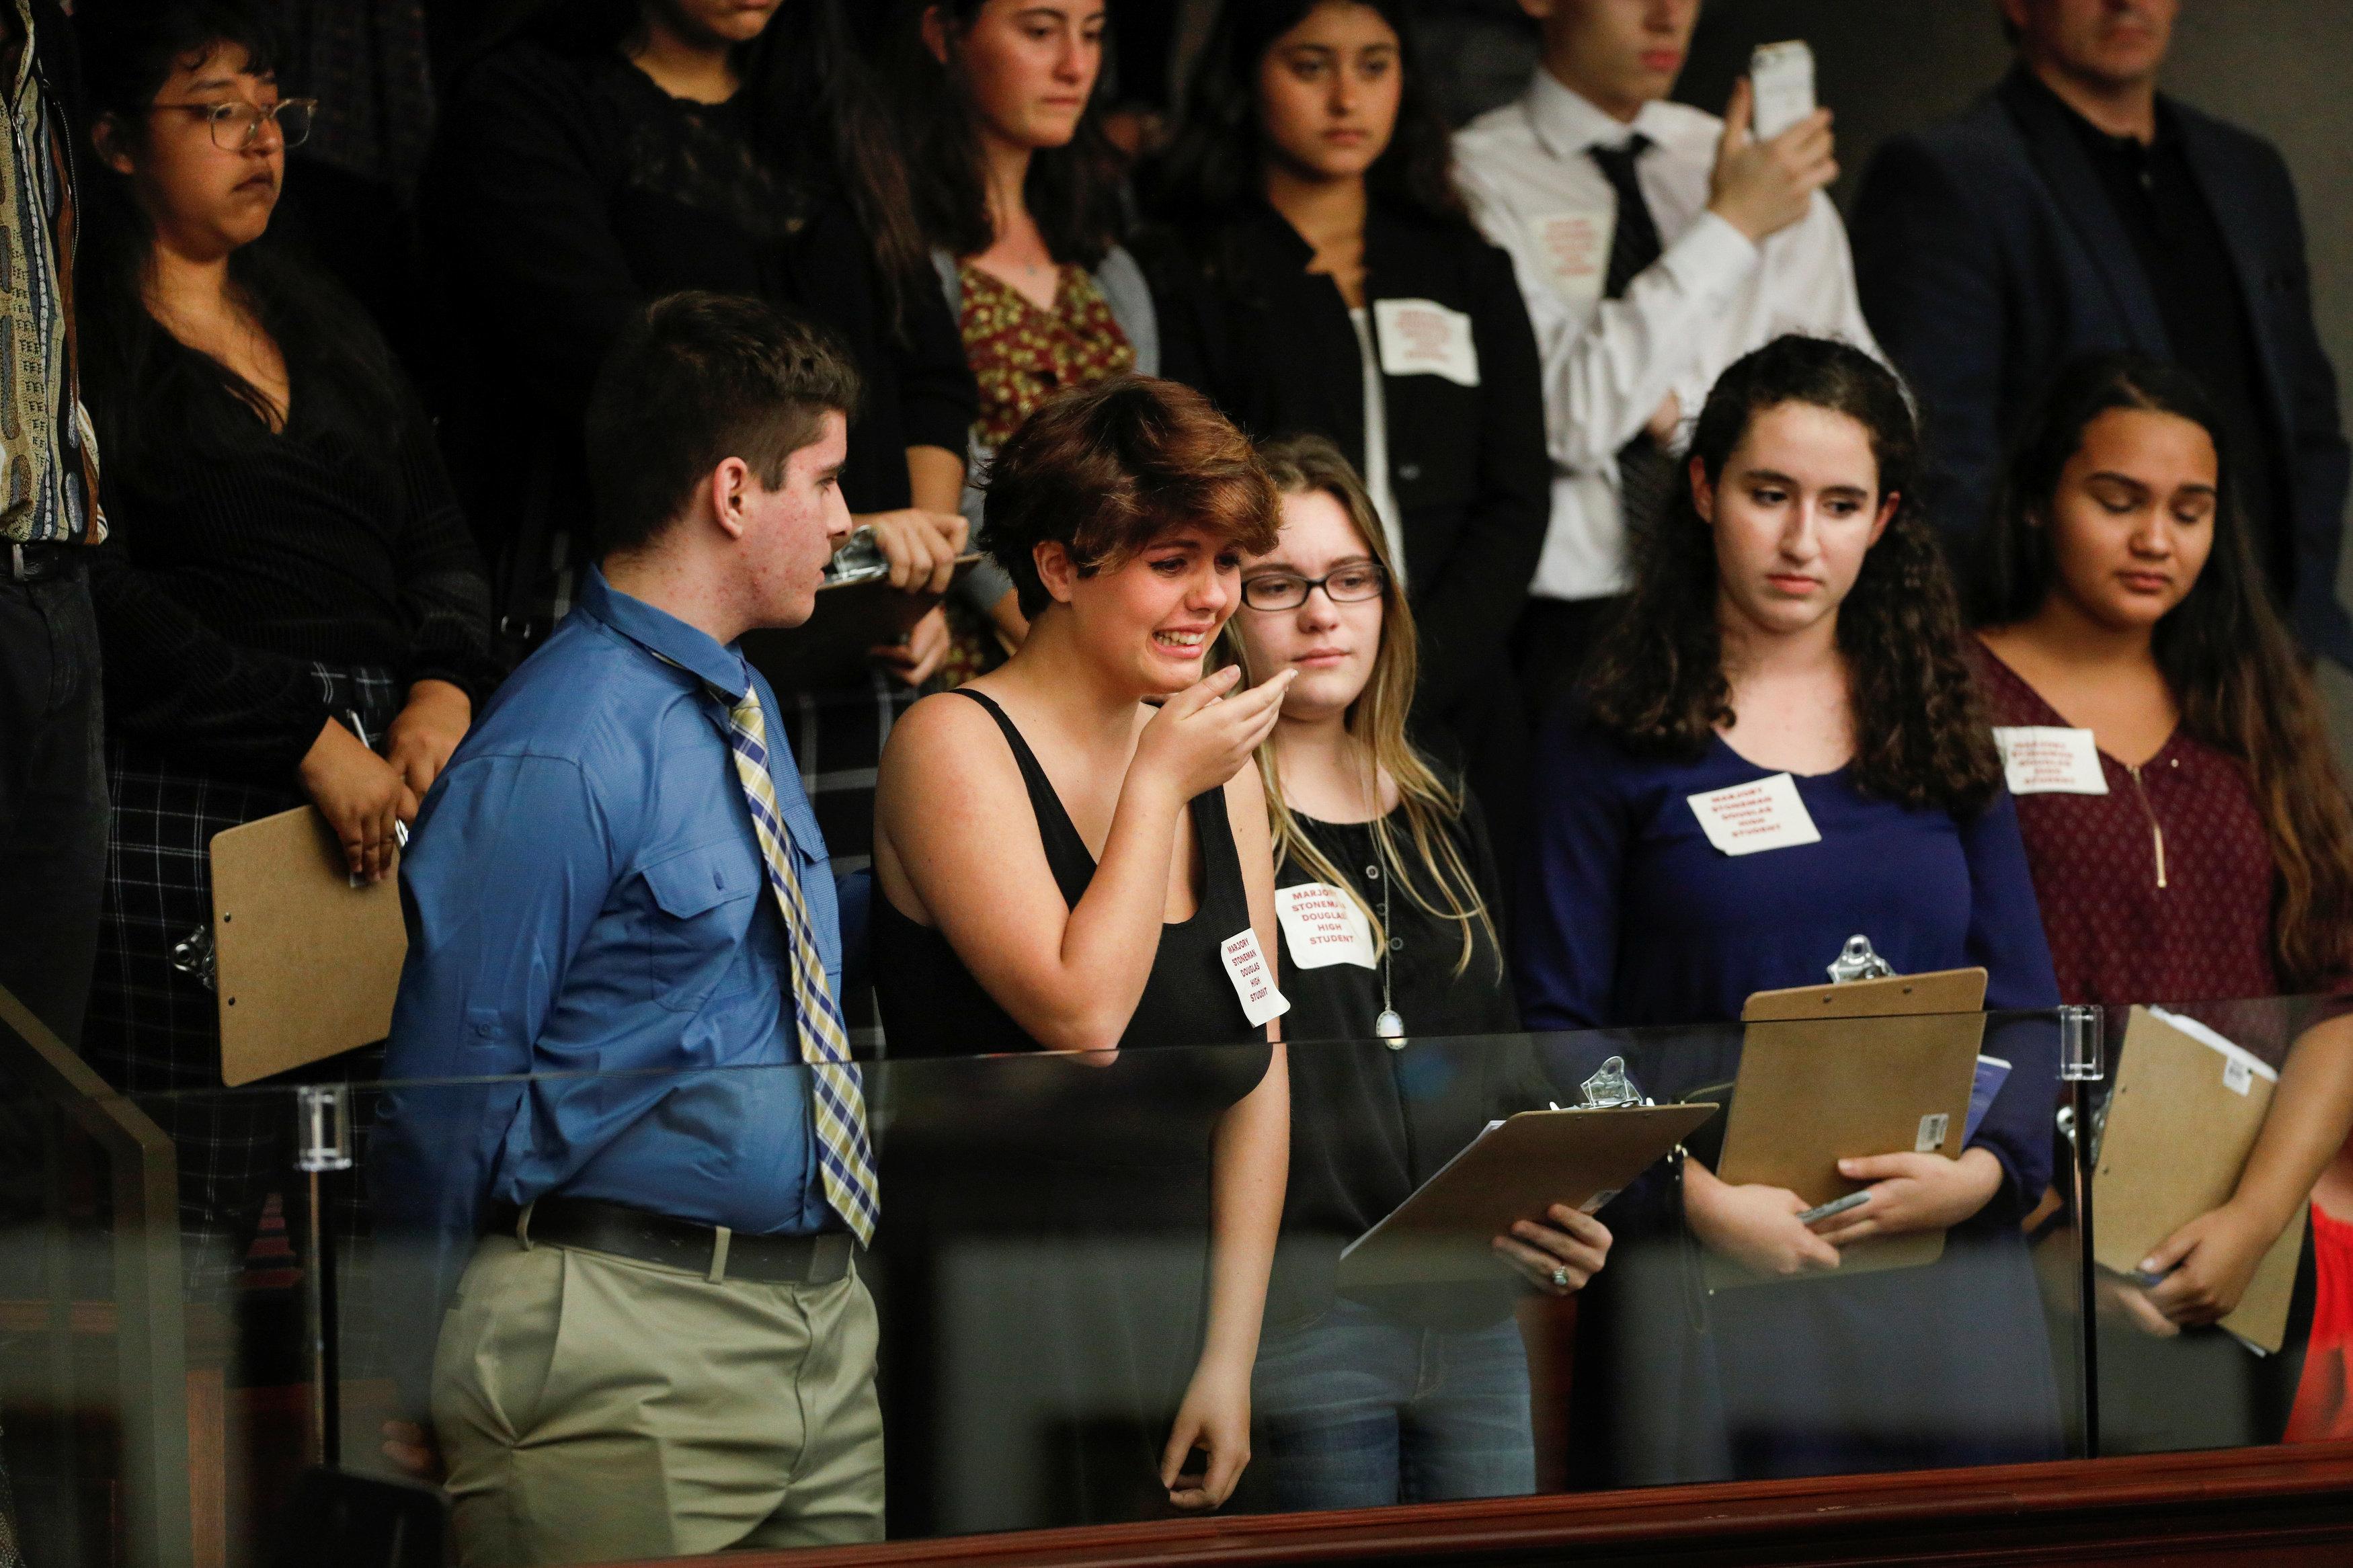 Parlament in Florida lehnt schärferes Waffenrecht ab [1:37]